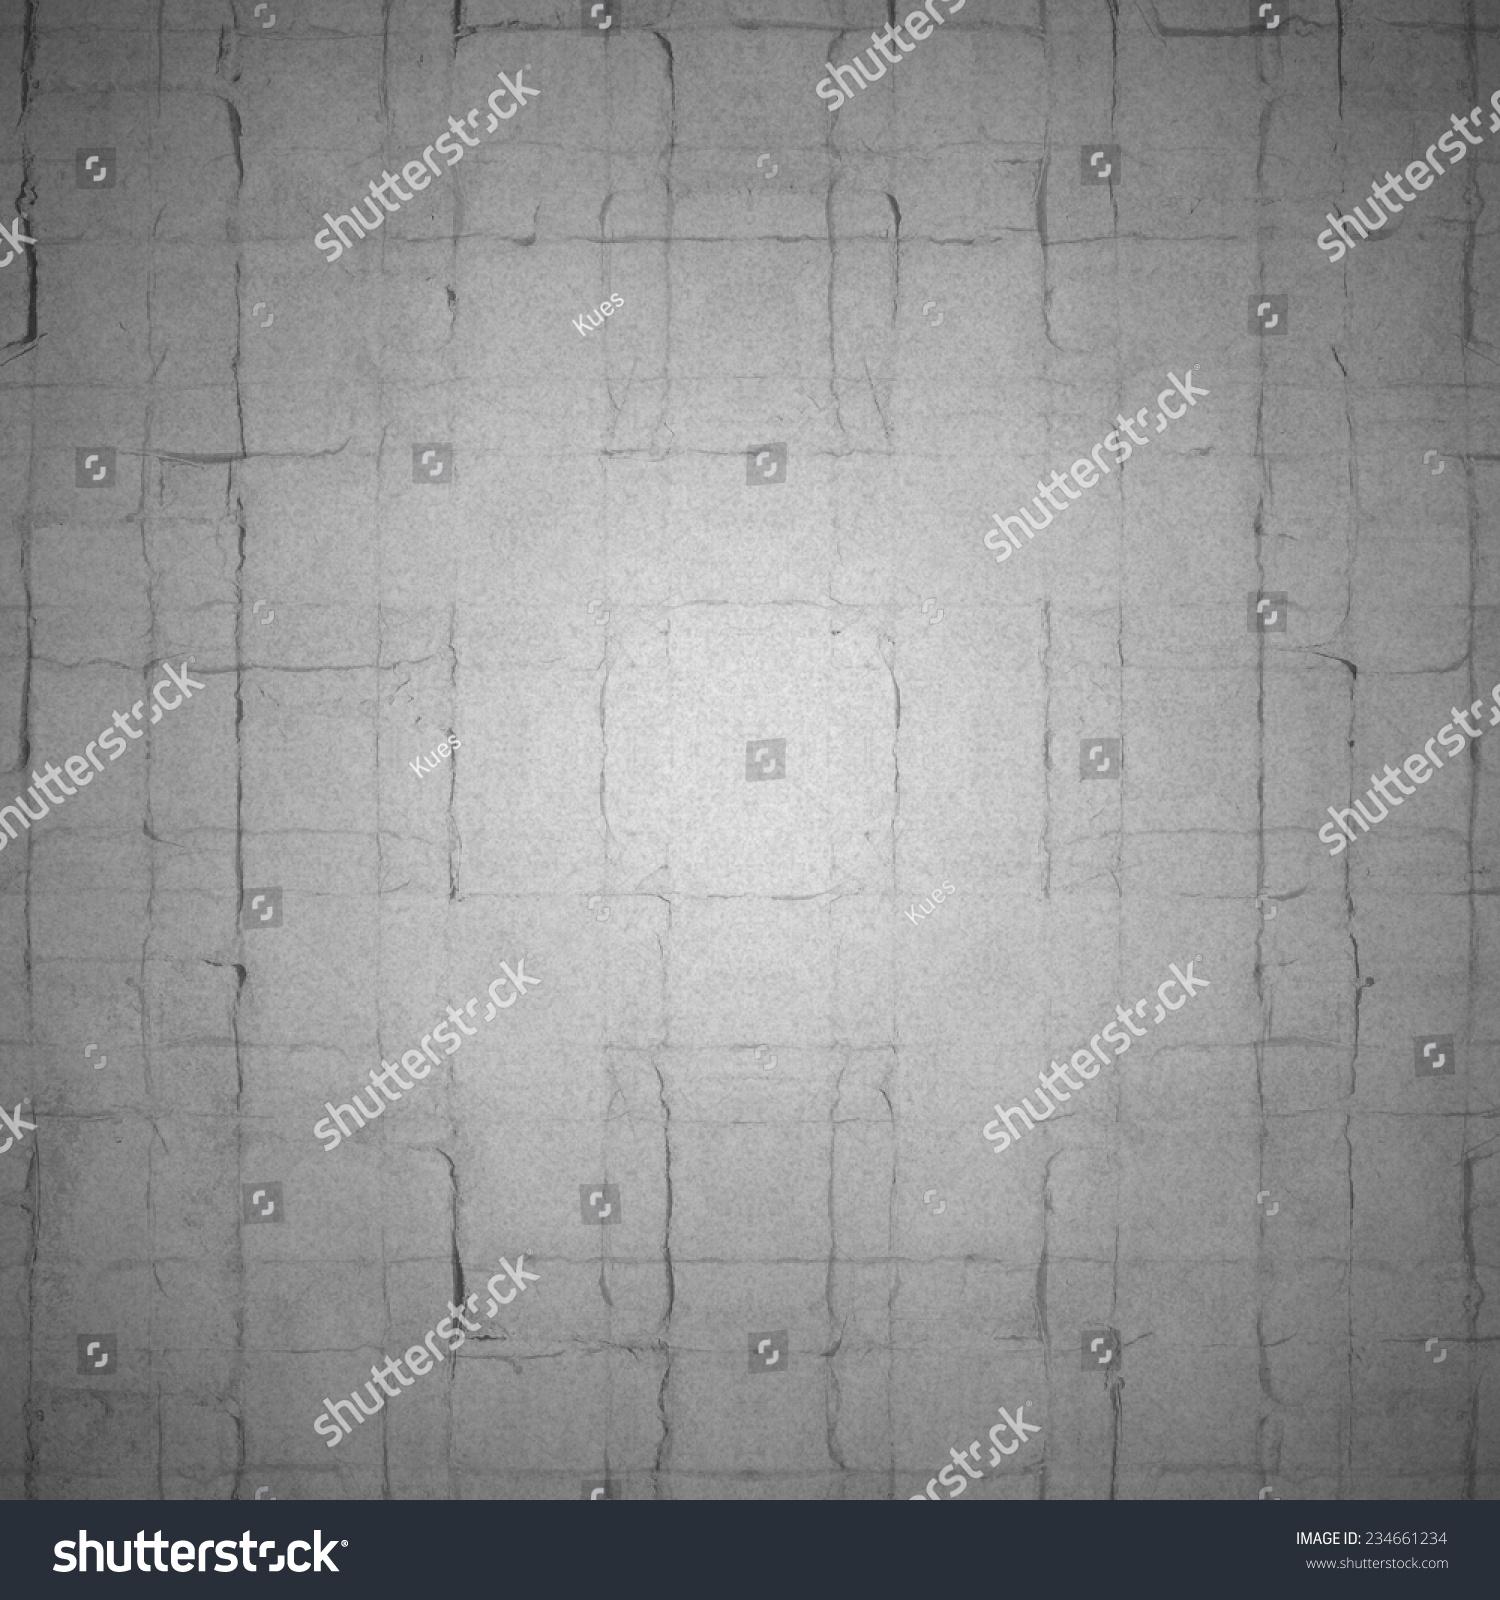 Problems With Brick Floors : Brick floor stock photo shutterstock